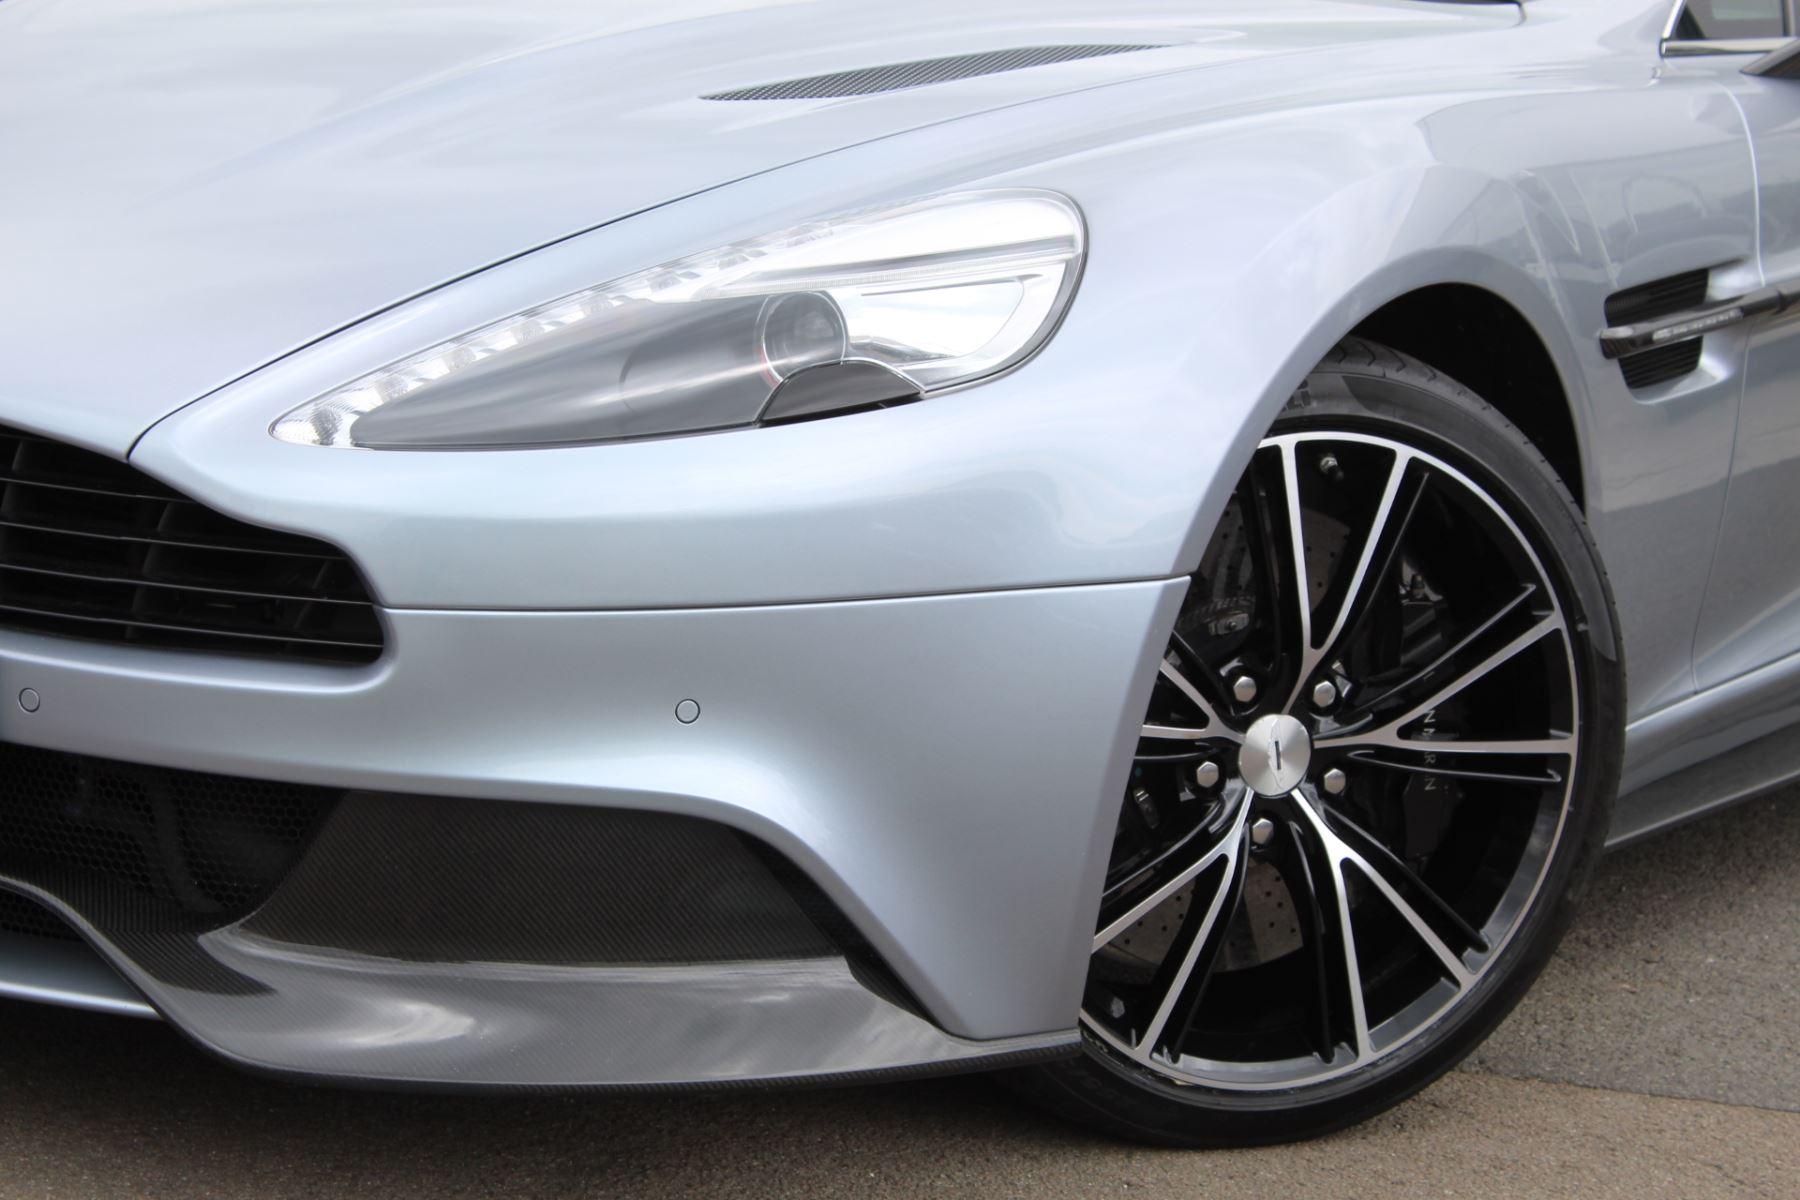 Aston Martin Vanquish V12 2+2 2dr Touchtronic image 3